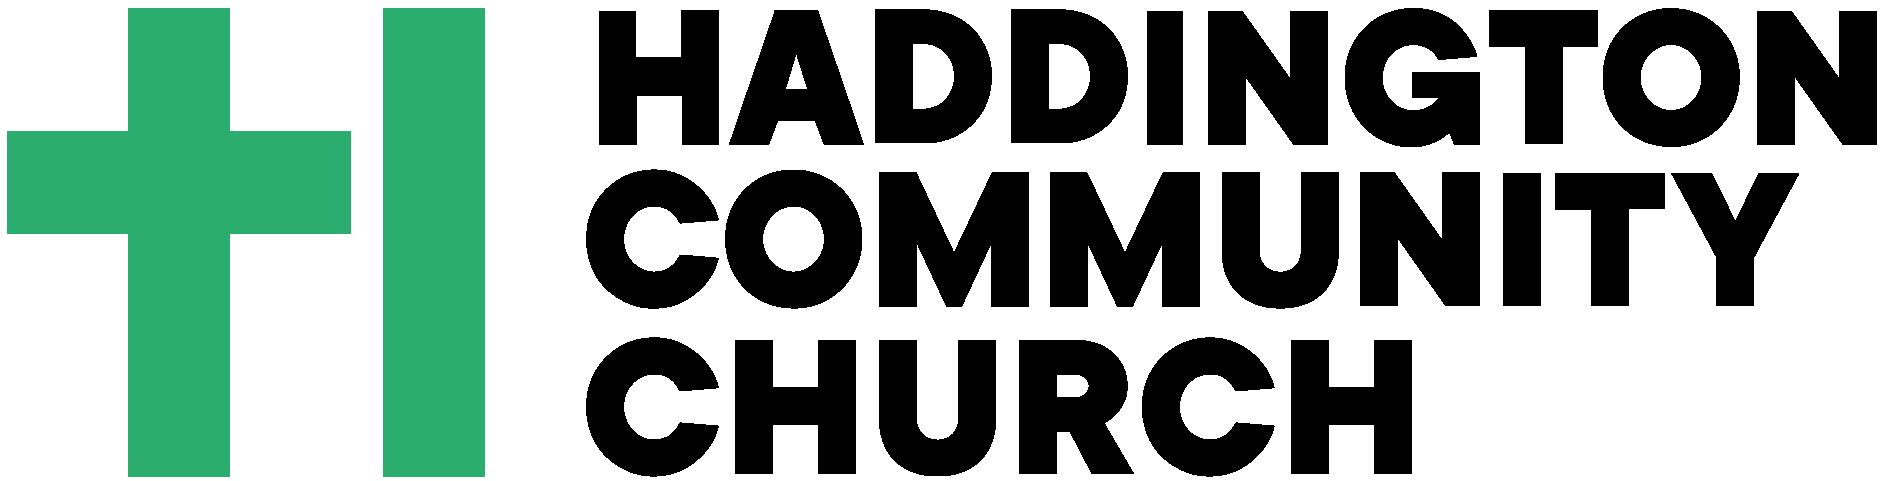 Haddington Community Church - Logo